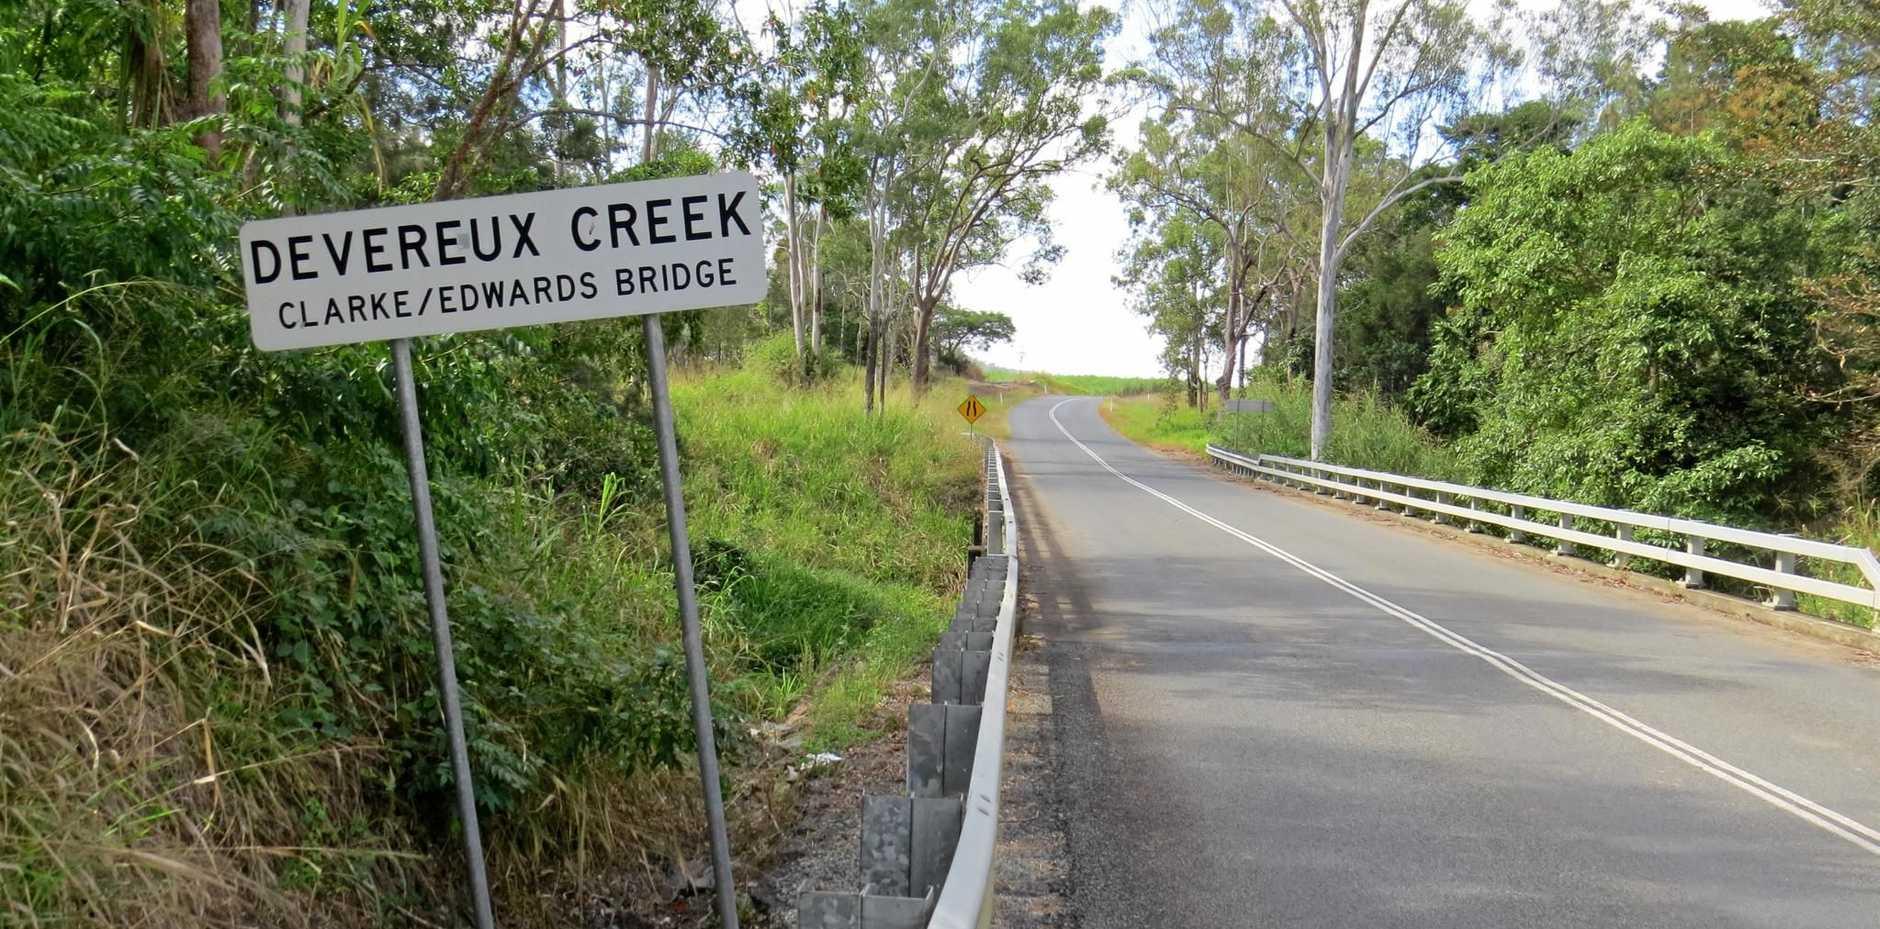 The bridge over Devereux Creek on Devereux Creek Rd.